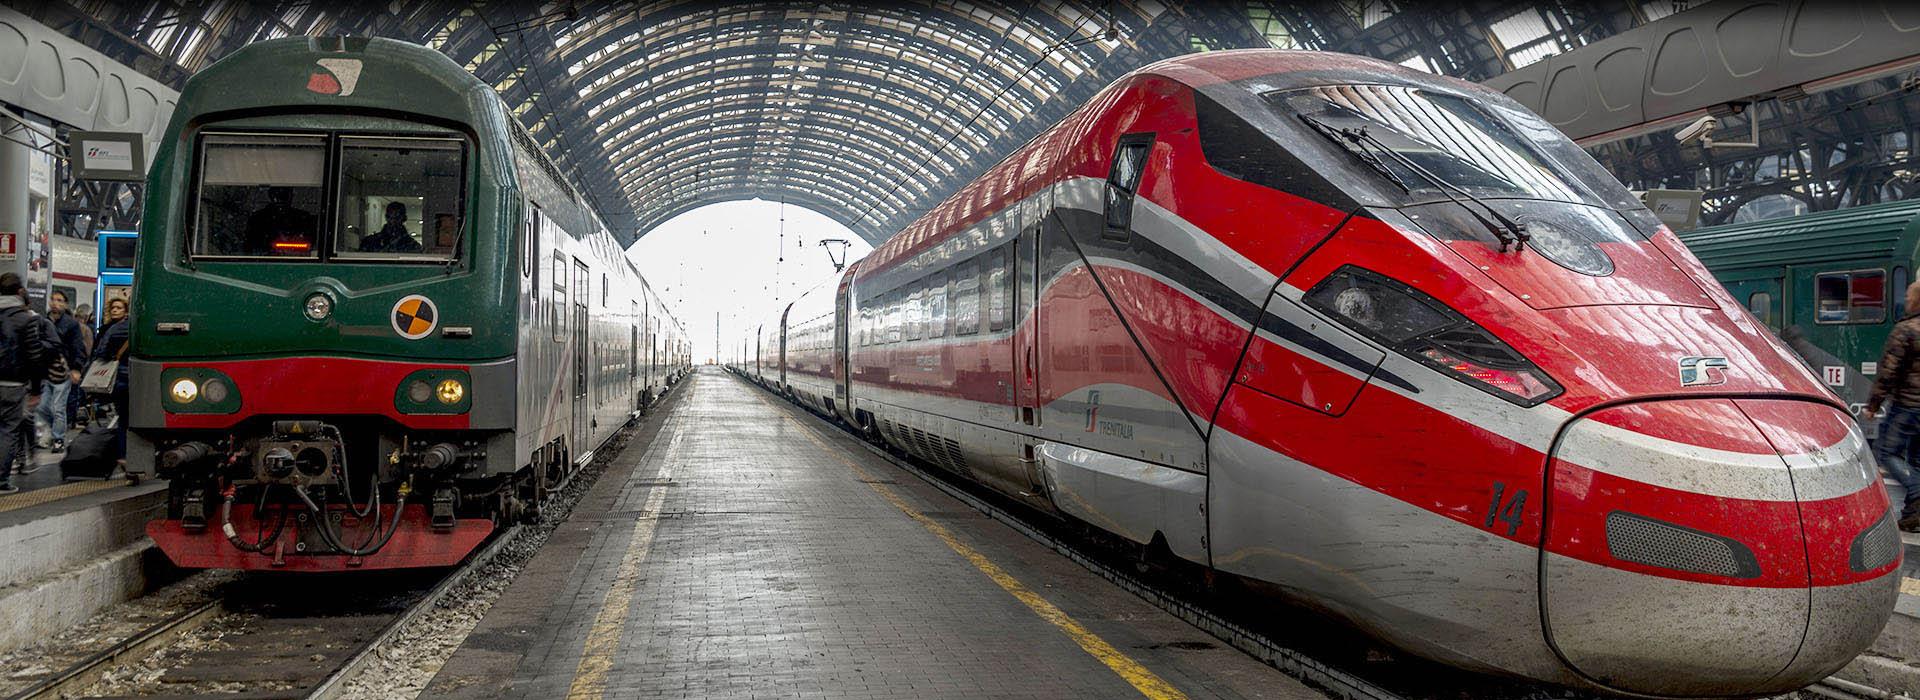 train_station1